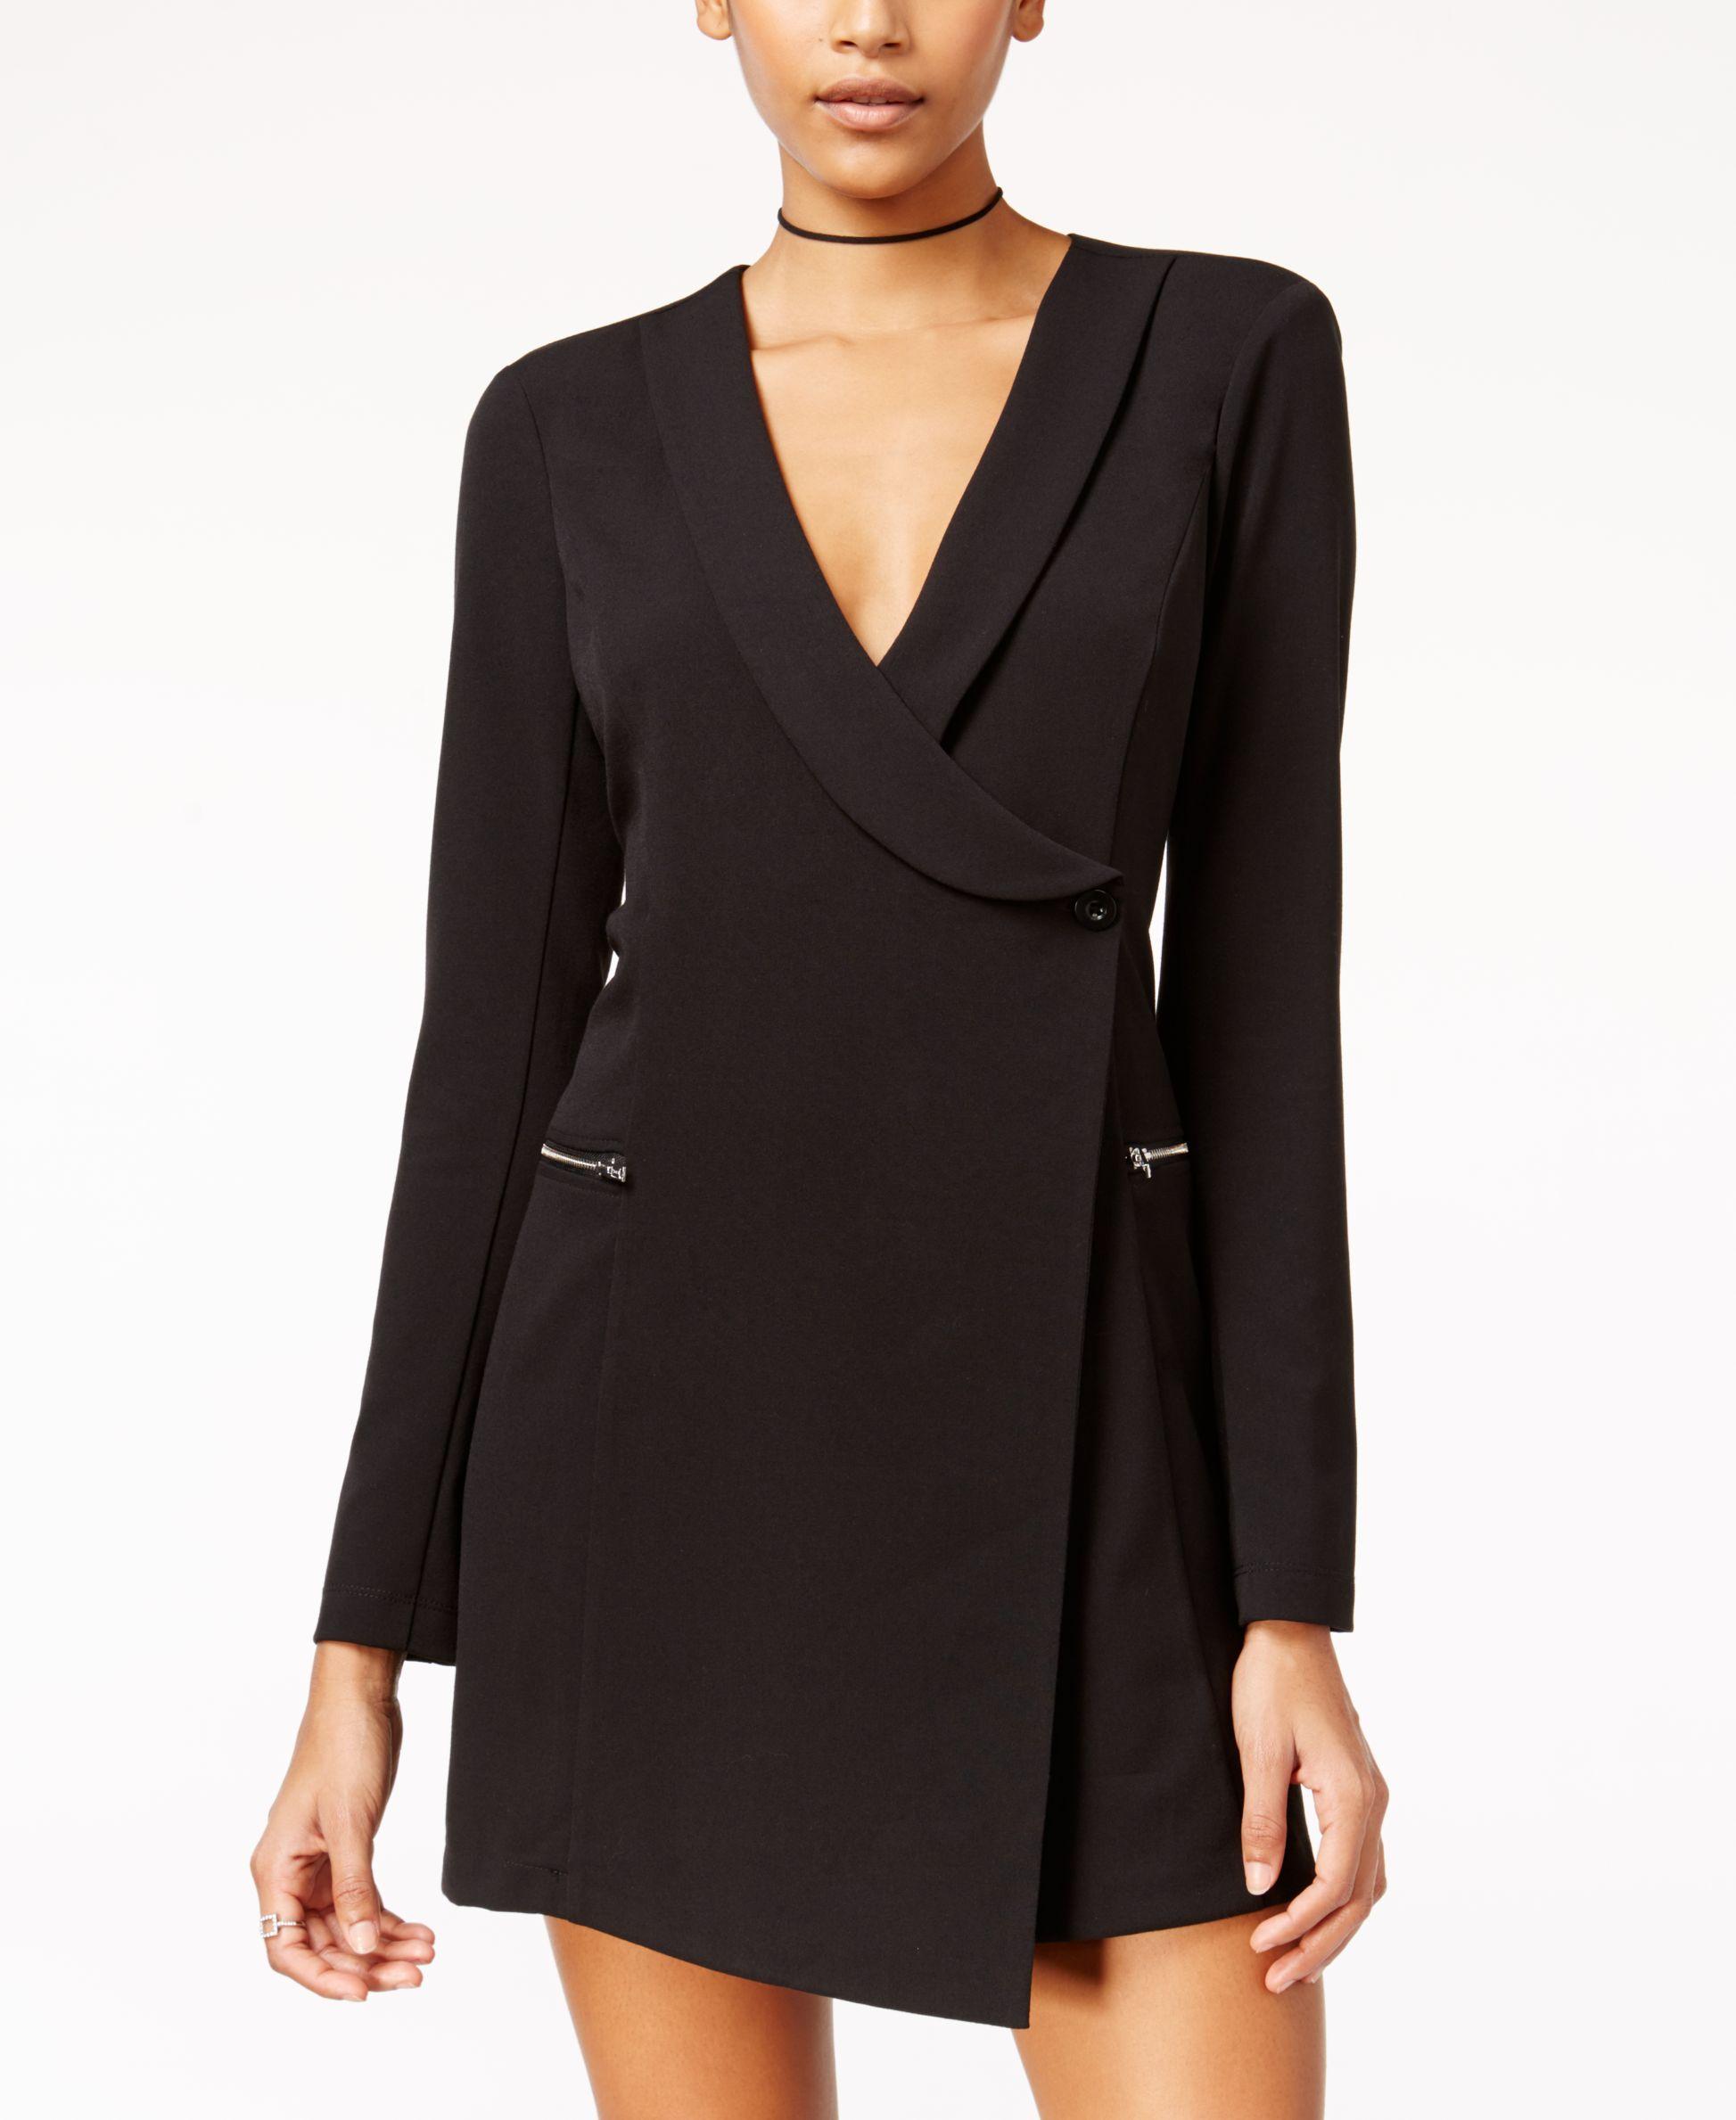 b8e109f0e4f Material Girl Juniors' Tuxedo Sheath Dress, Only at Macy's | Food ...